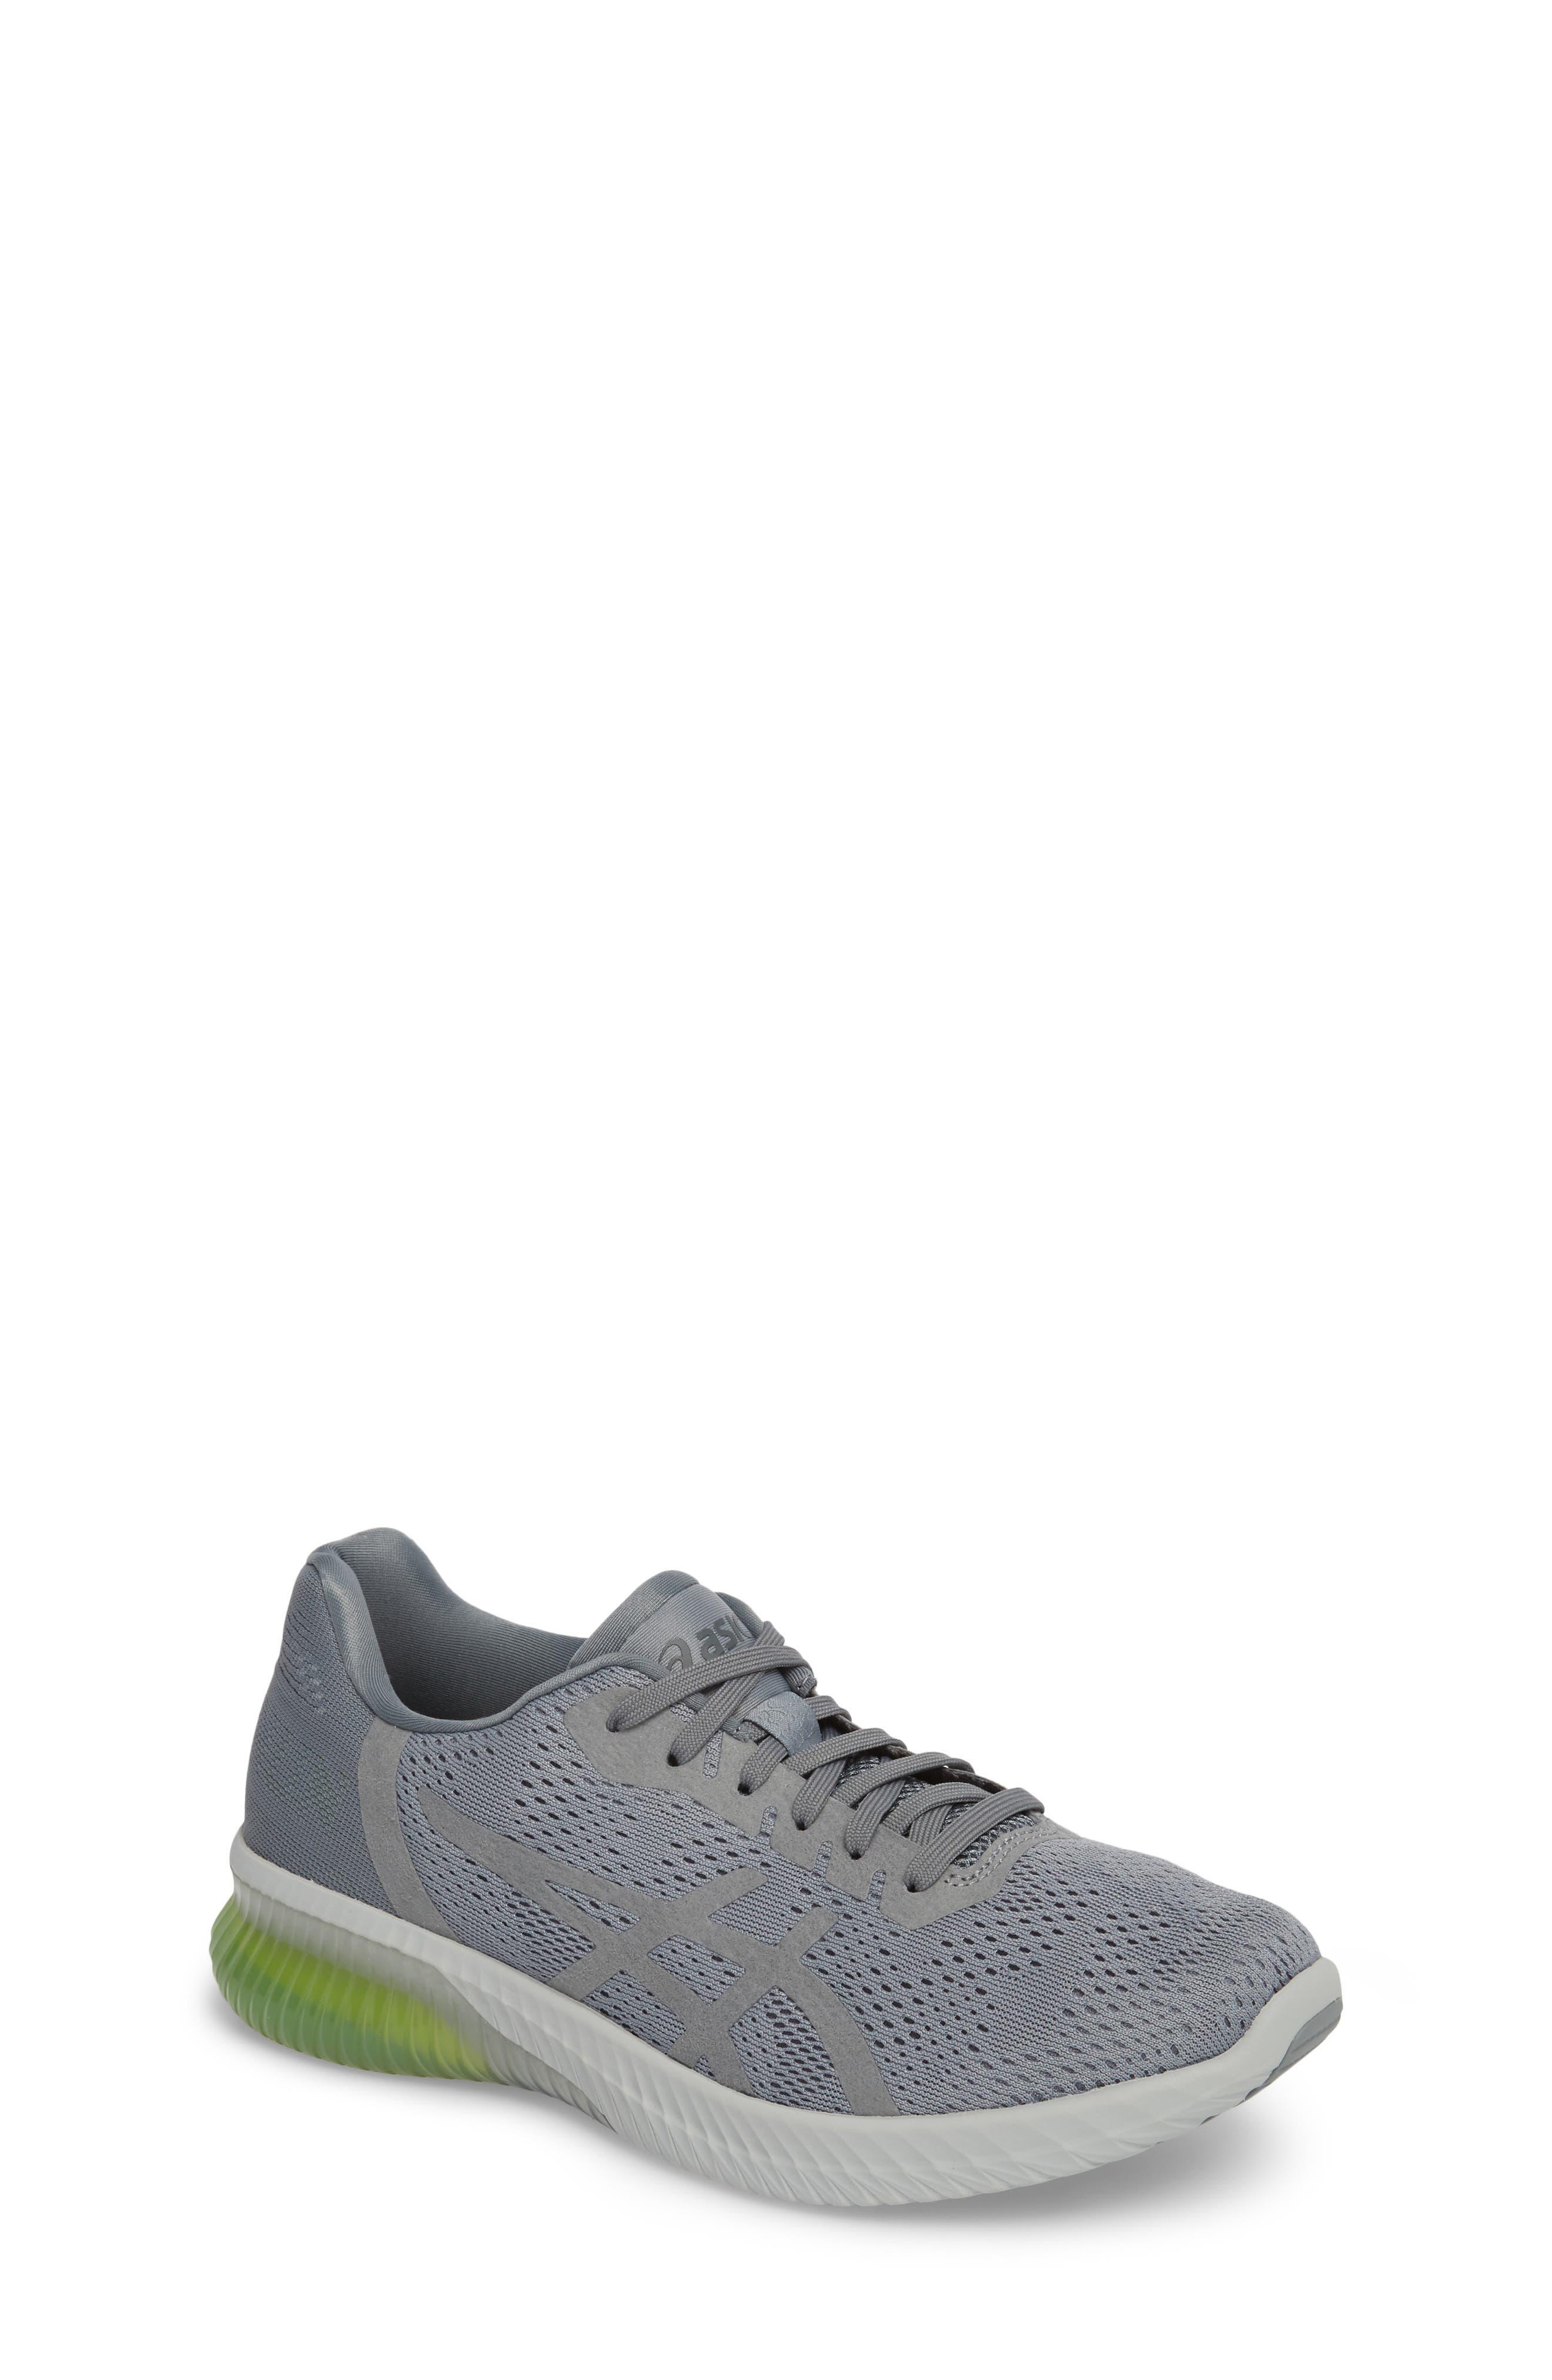 Gel-Kenun Running Shoe,                         Main,                         color, 023